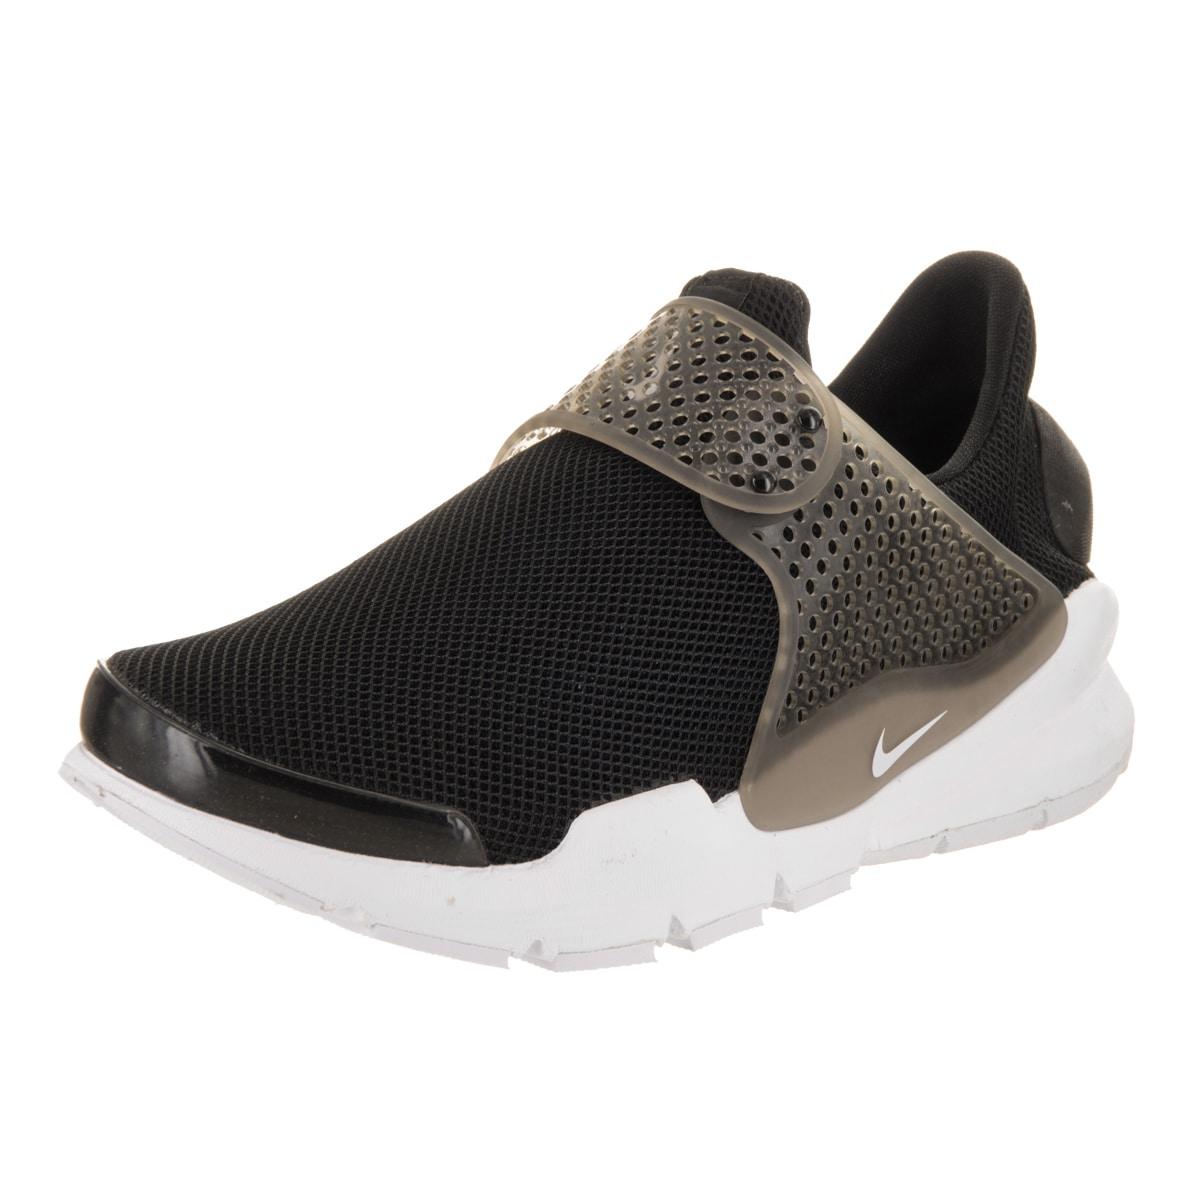 Nike Women's Sock Dart BR Black Synthetic-leather Running...